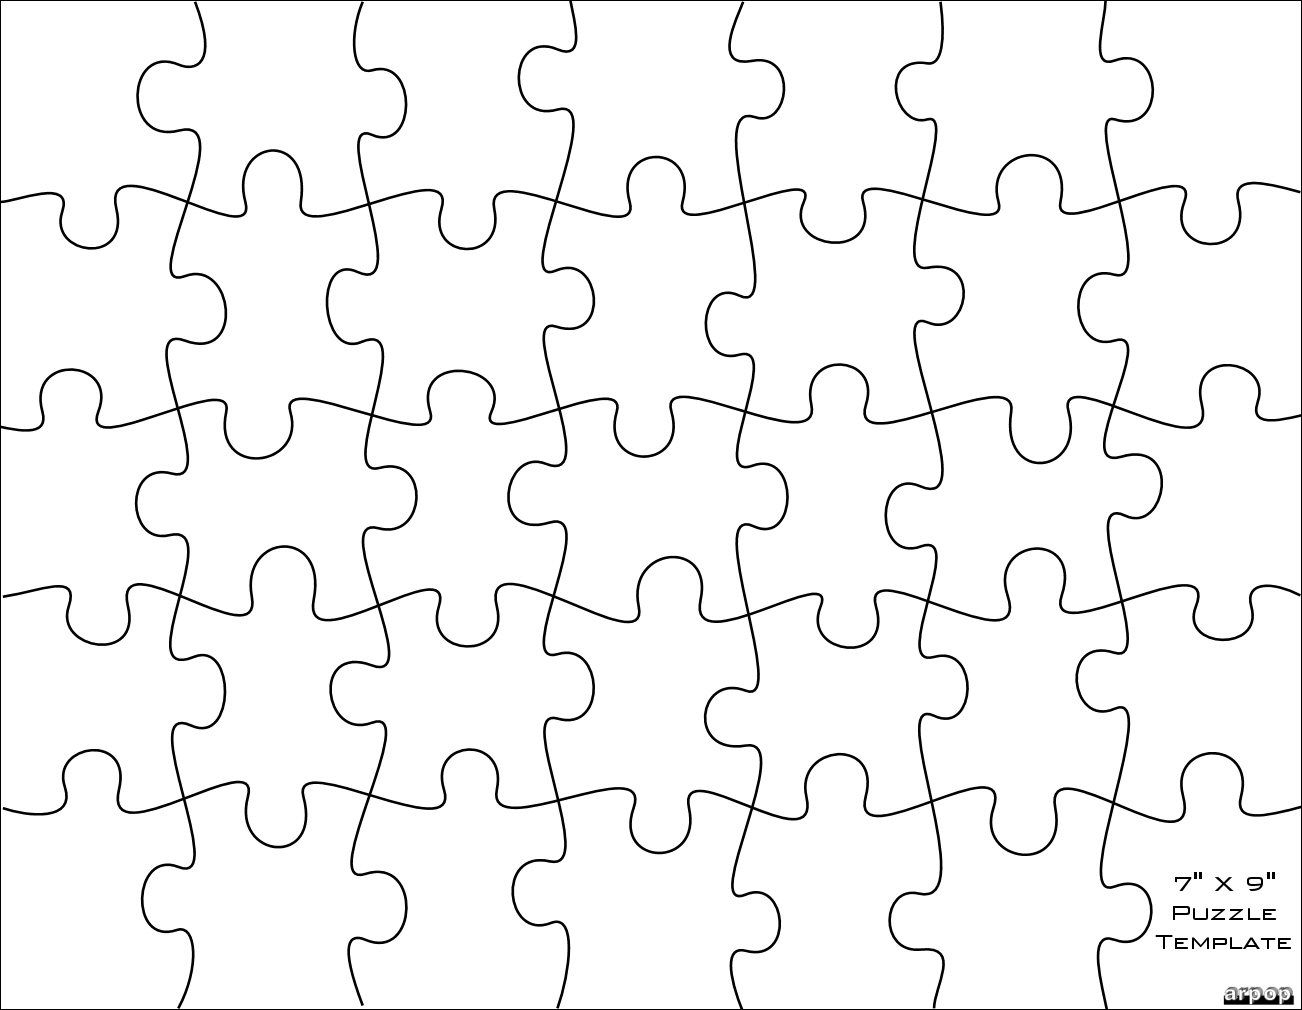 Free Scroll Saw Patternsarpop: Jigsaw Puzzle Templates   School - Printable Puzzle Jigsaw